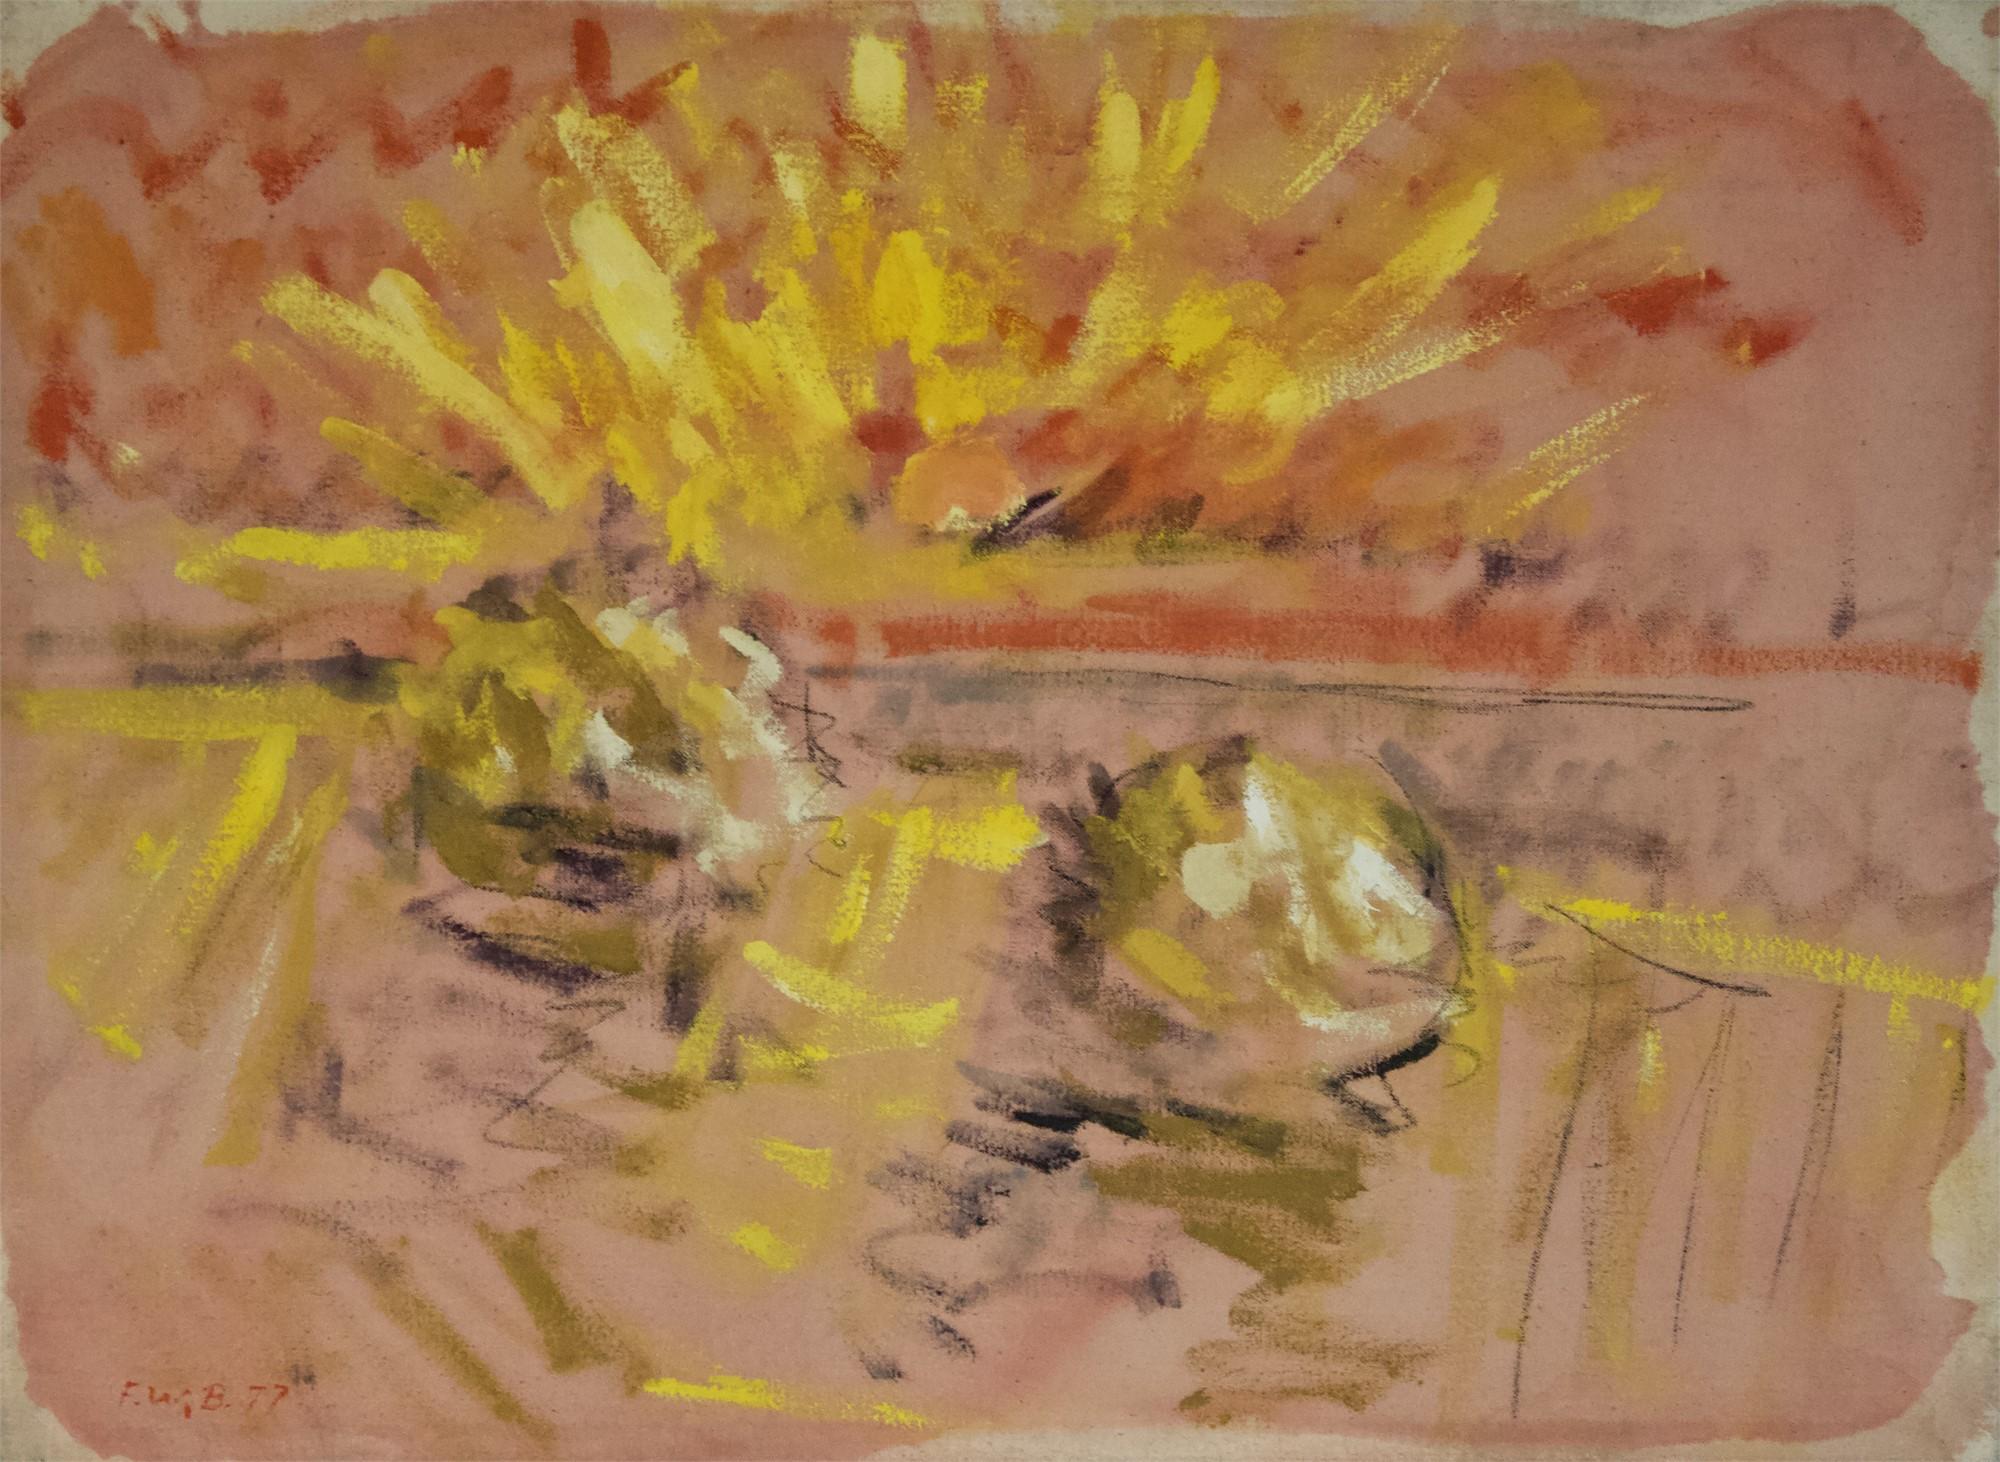 Haystacks by Freeman W. Butts (1928-1998)